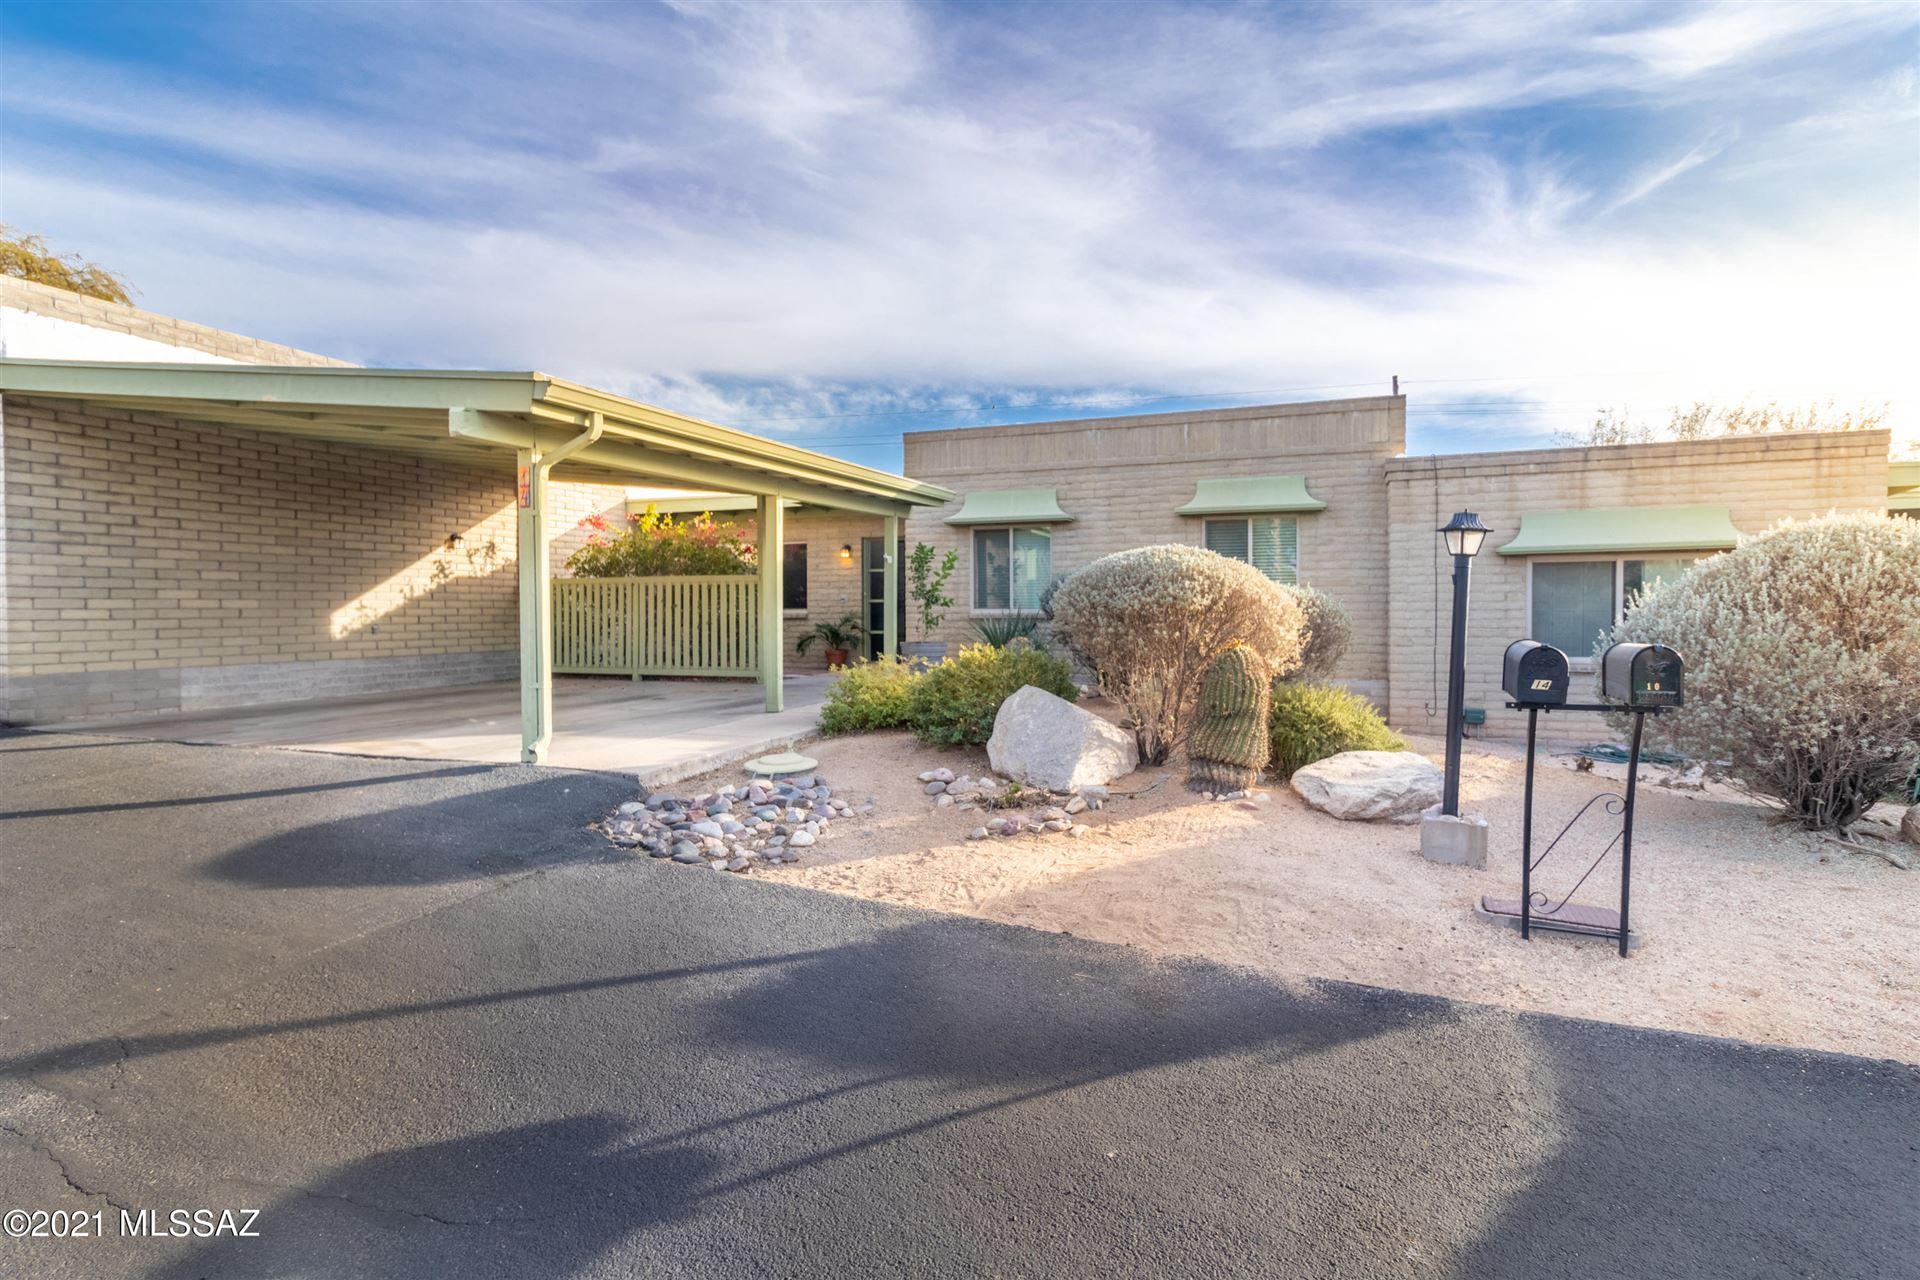 14 E Madrid Drive, Tucson, AZ 85704 - MLS#: 22100779